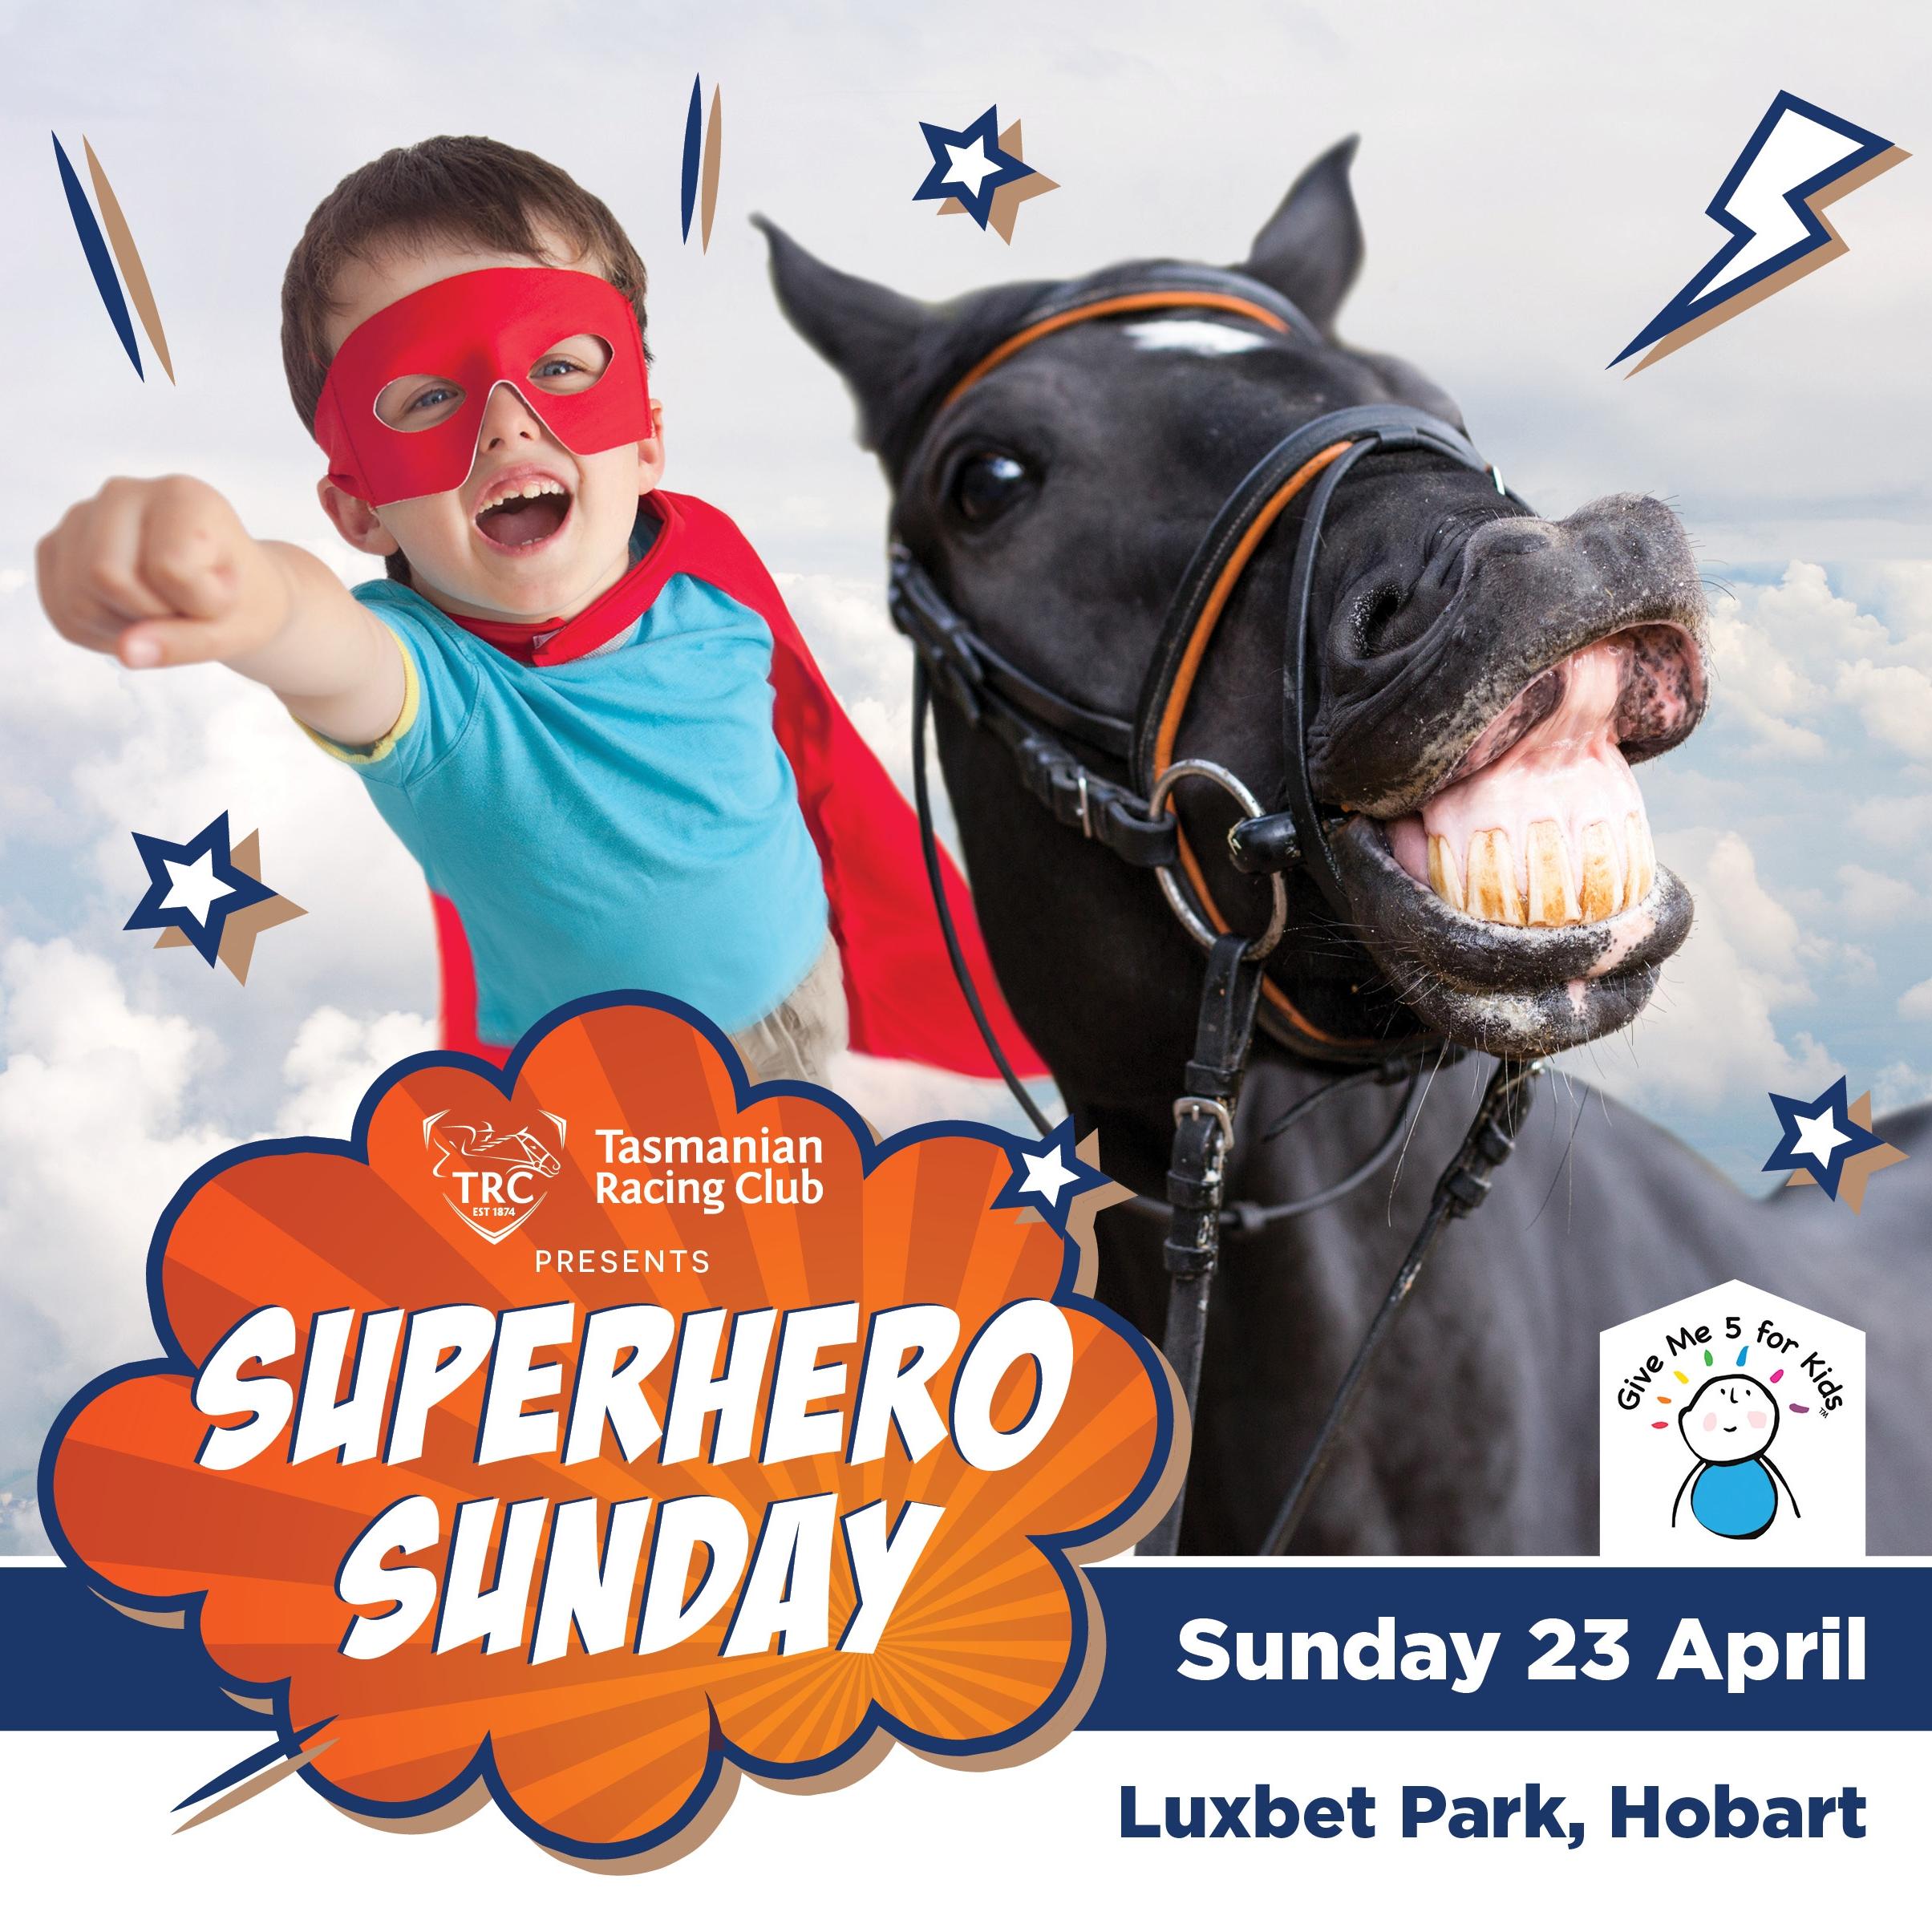 Superhero Sunday   Sunday 23rd April 2017